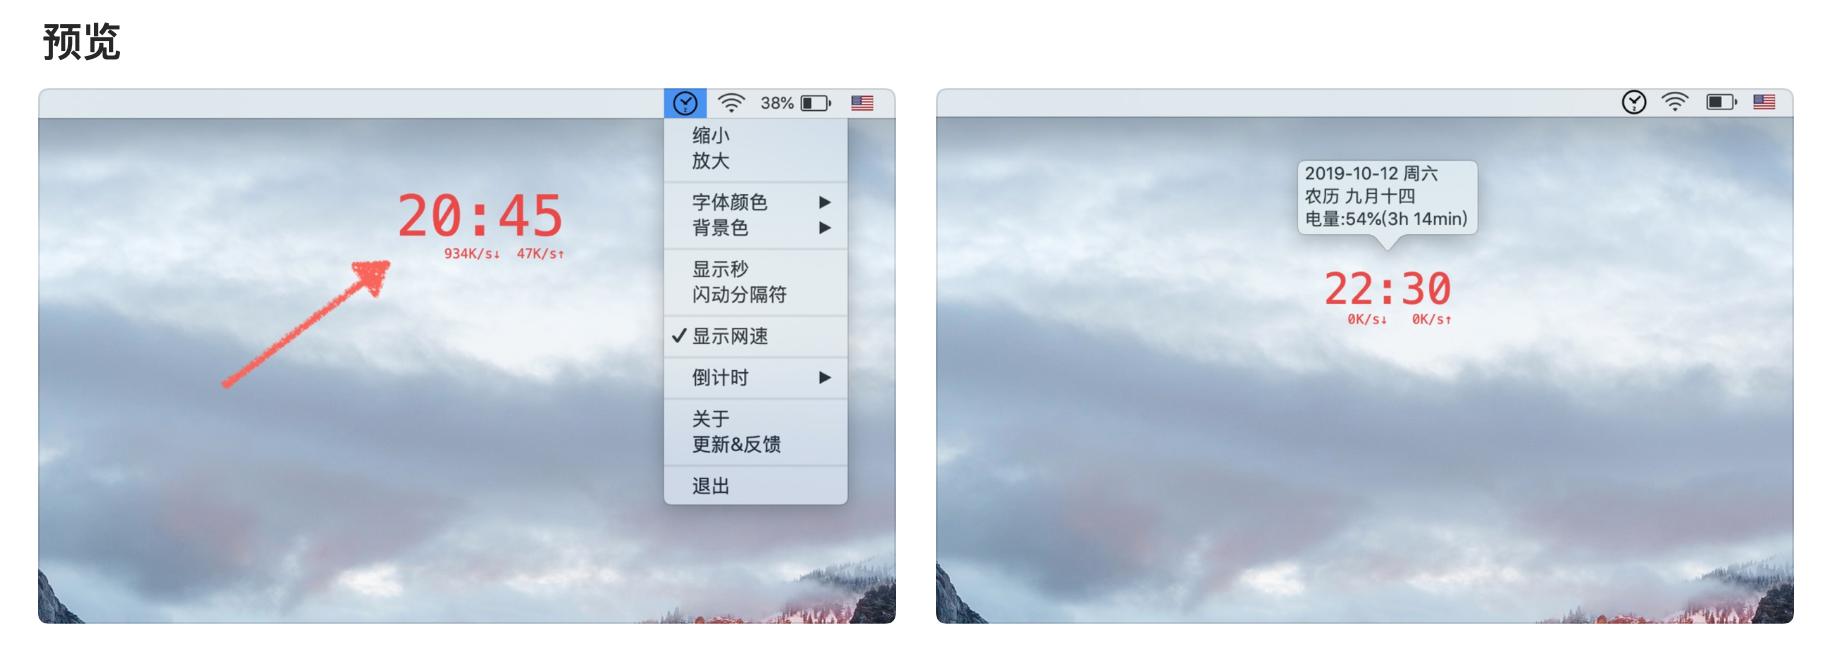 zClock - Mac 桌面時鐘,在桌面置頂顯示極簡時鐘、倒計時、網速 2